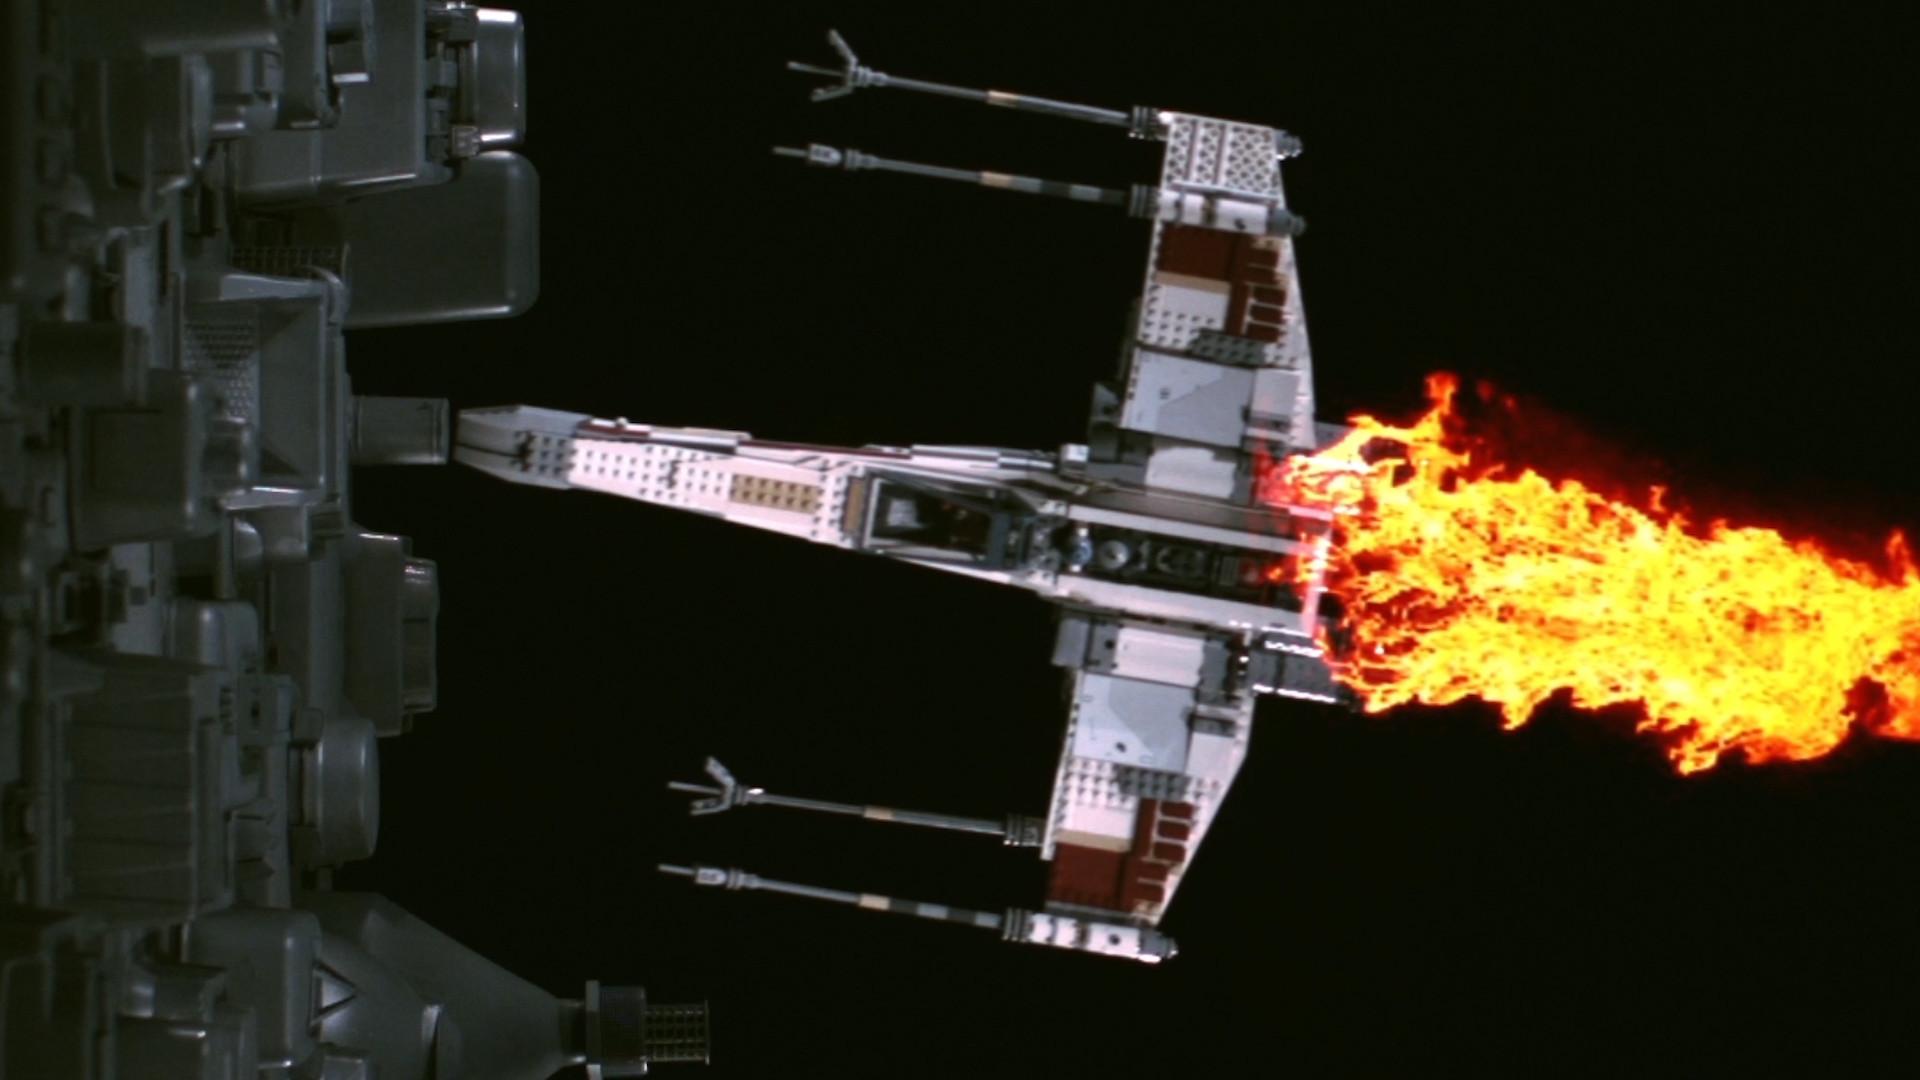 Star Wars Lego X-Wing Fighter vs. Death Star